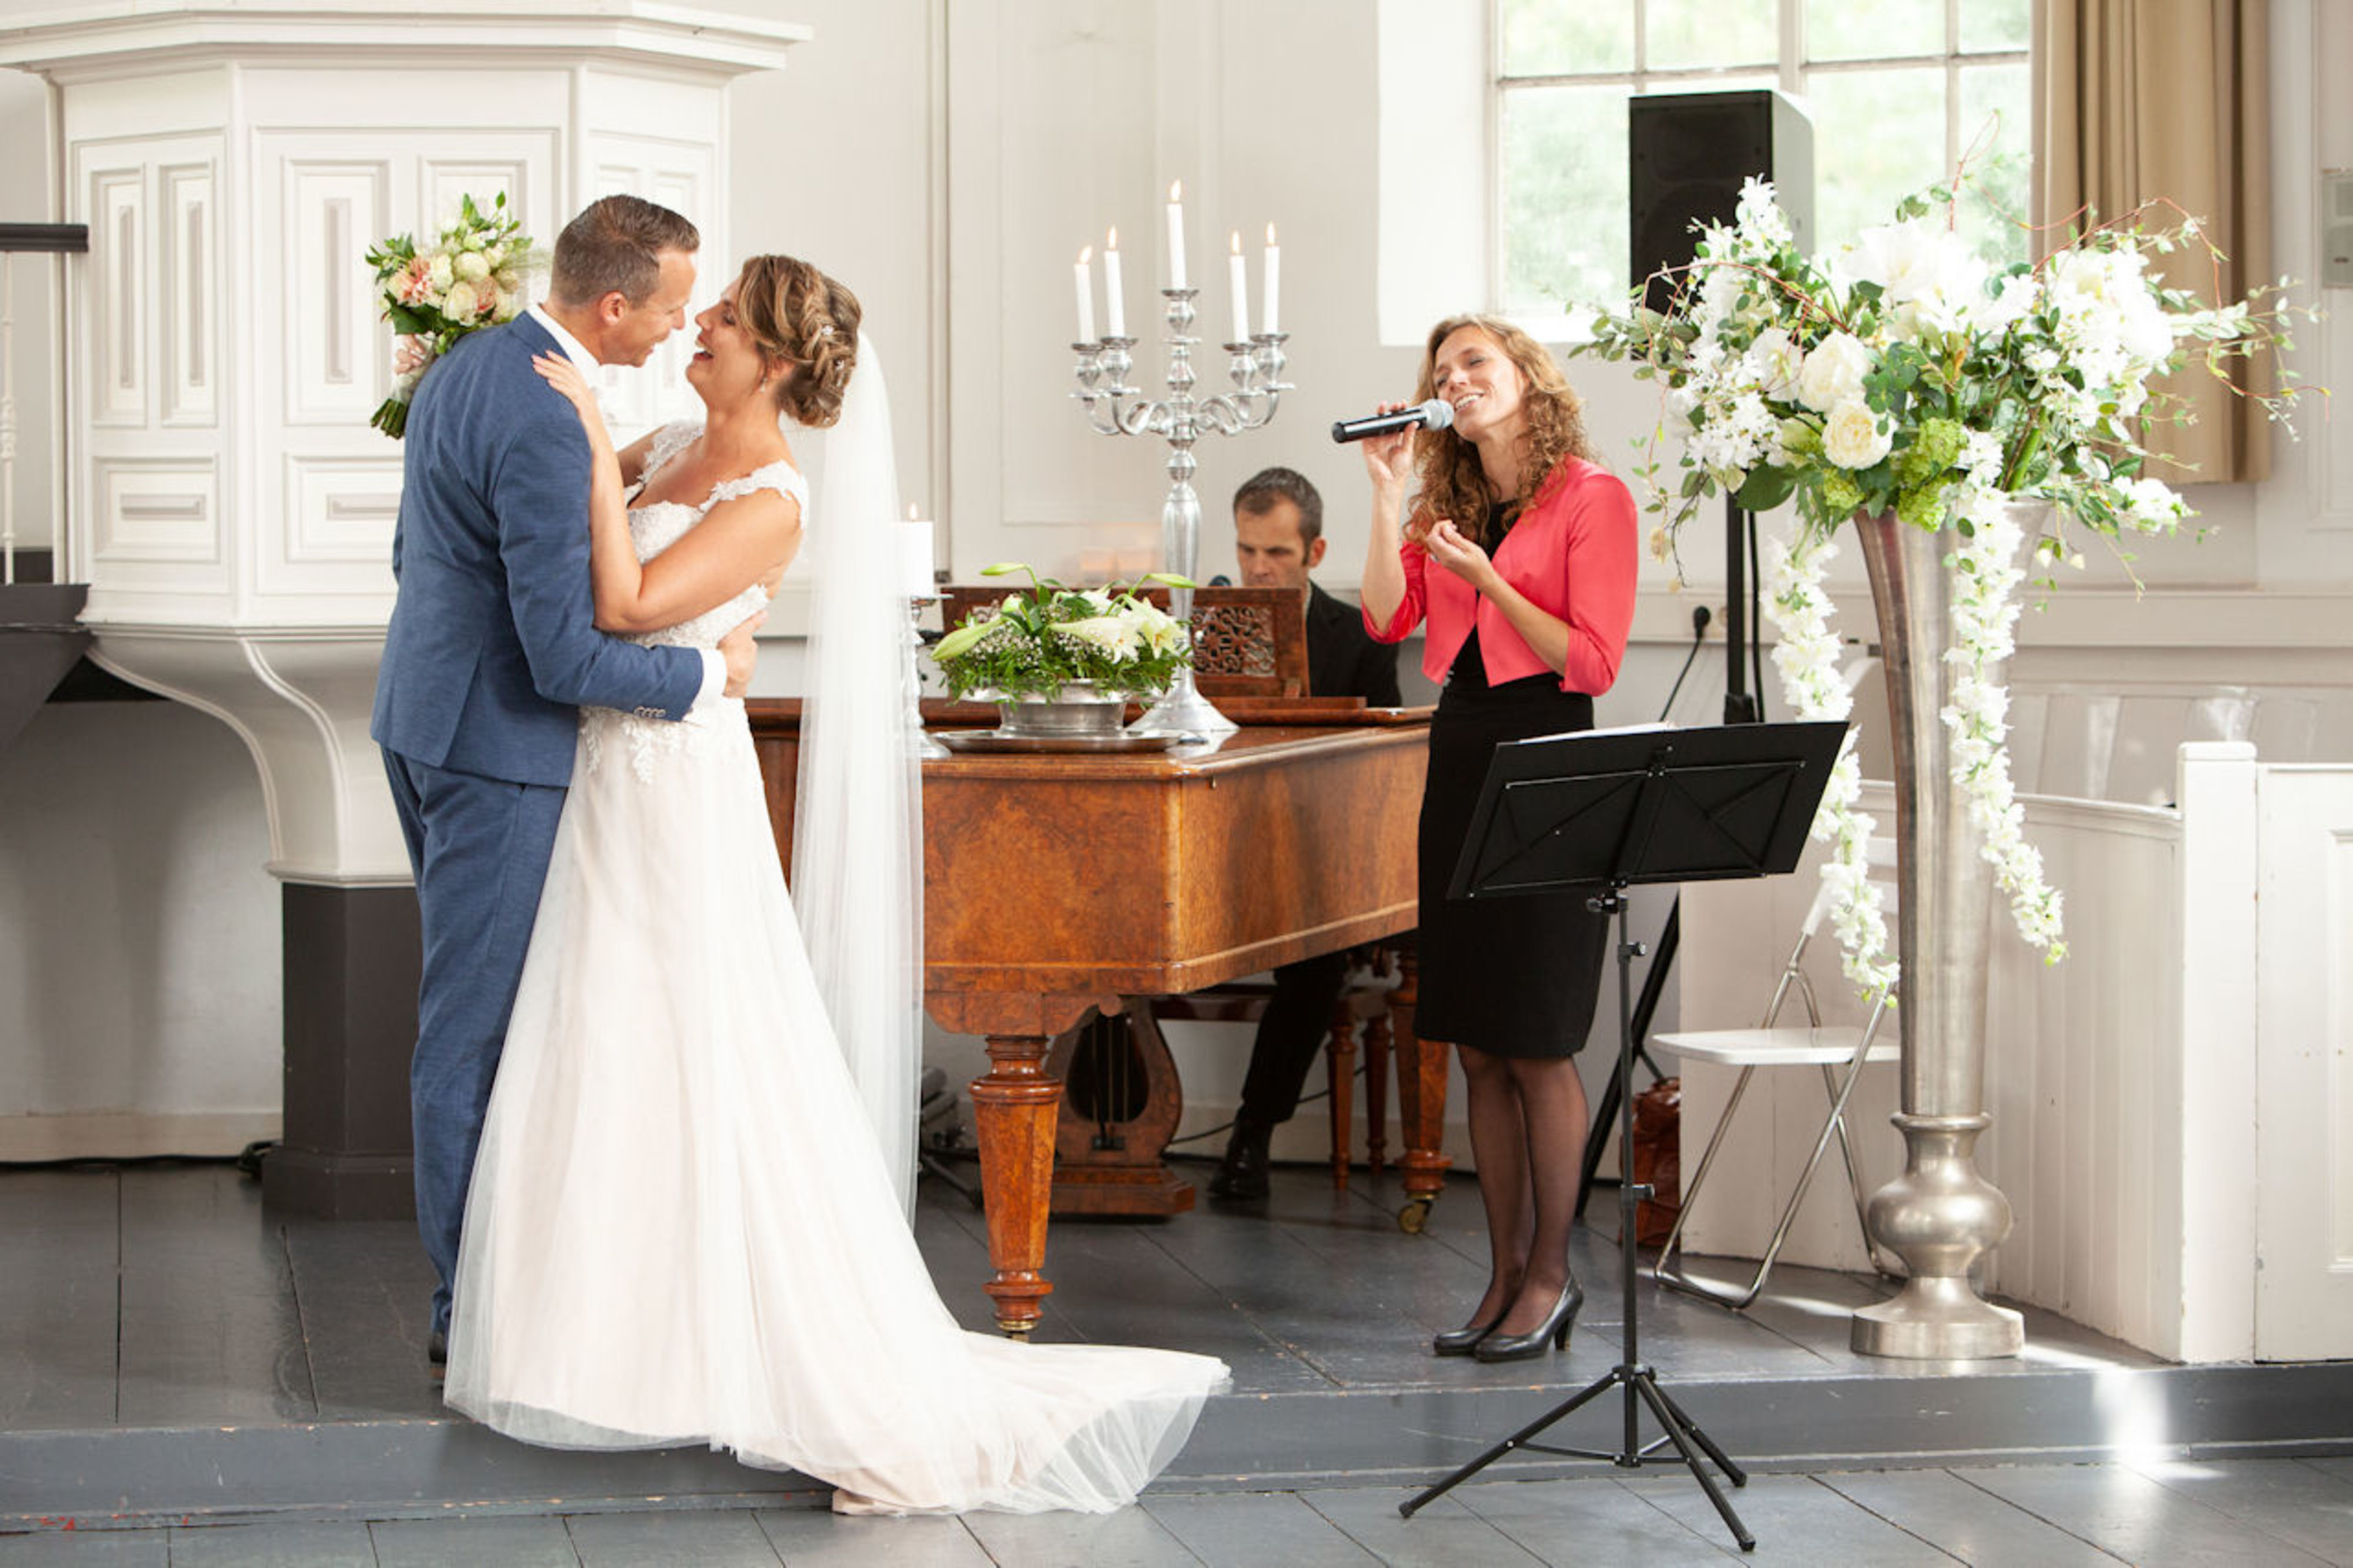 Livemuziek tijdens trouwceremonie